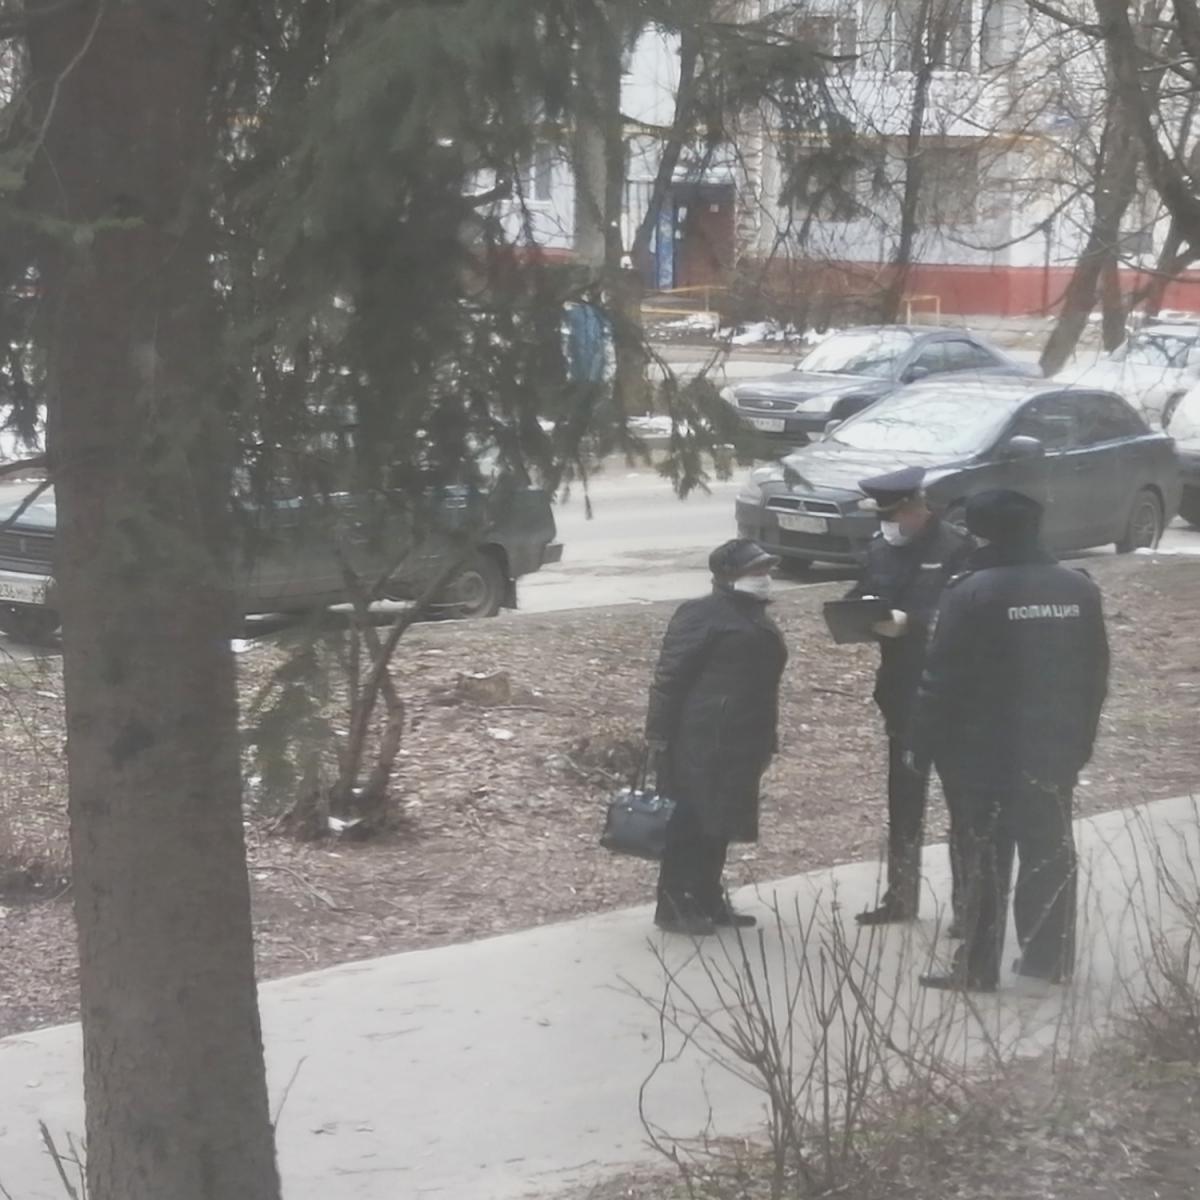 В Брянске полицейские поймали старушку, которая нарушила режим самоизоляции